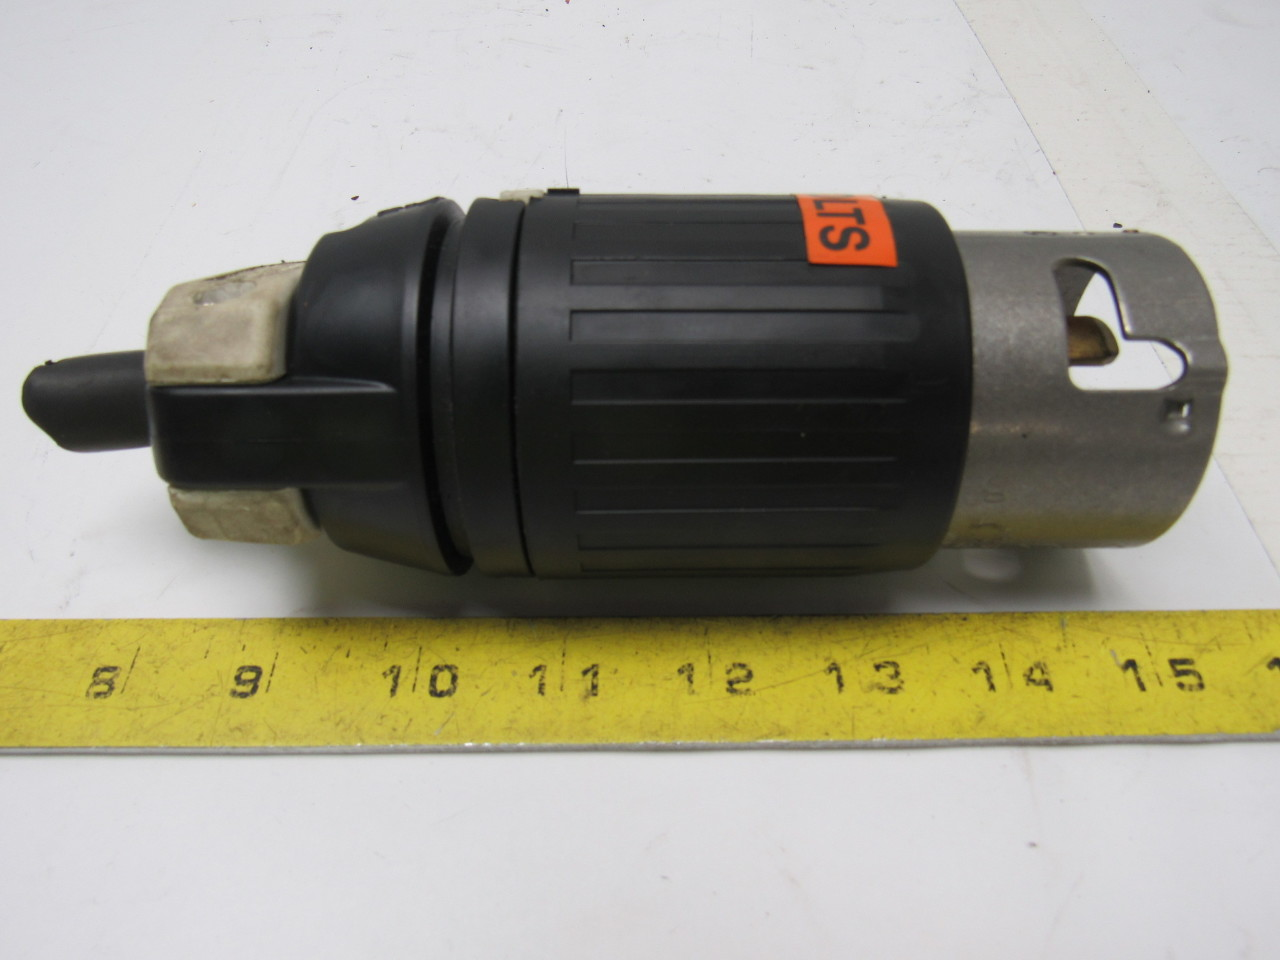 Hubbell Cs8165c Twist Lock 50 Amp 480 V 3 Phase Male Plug